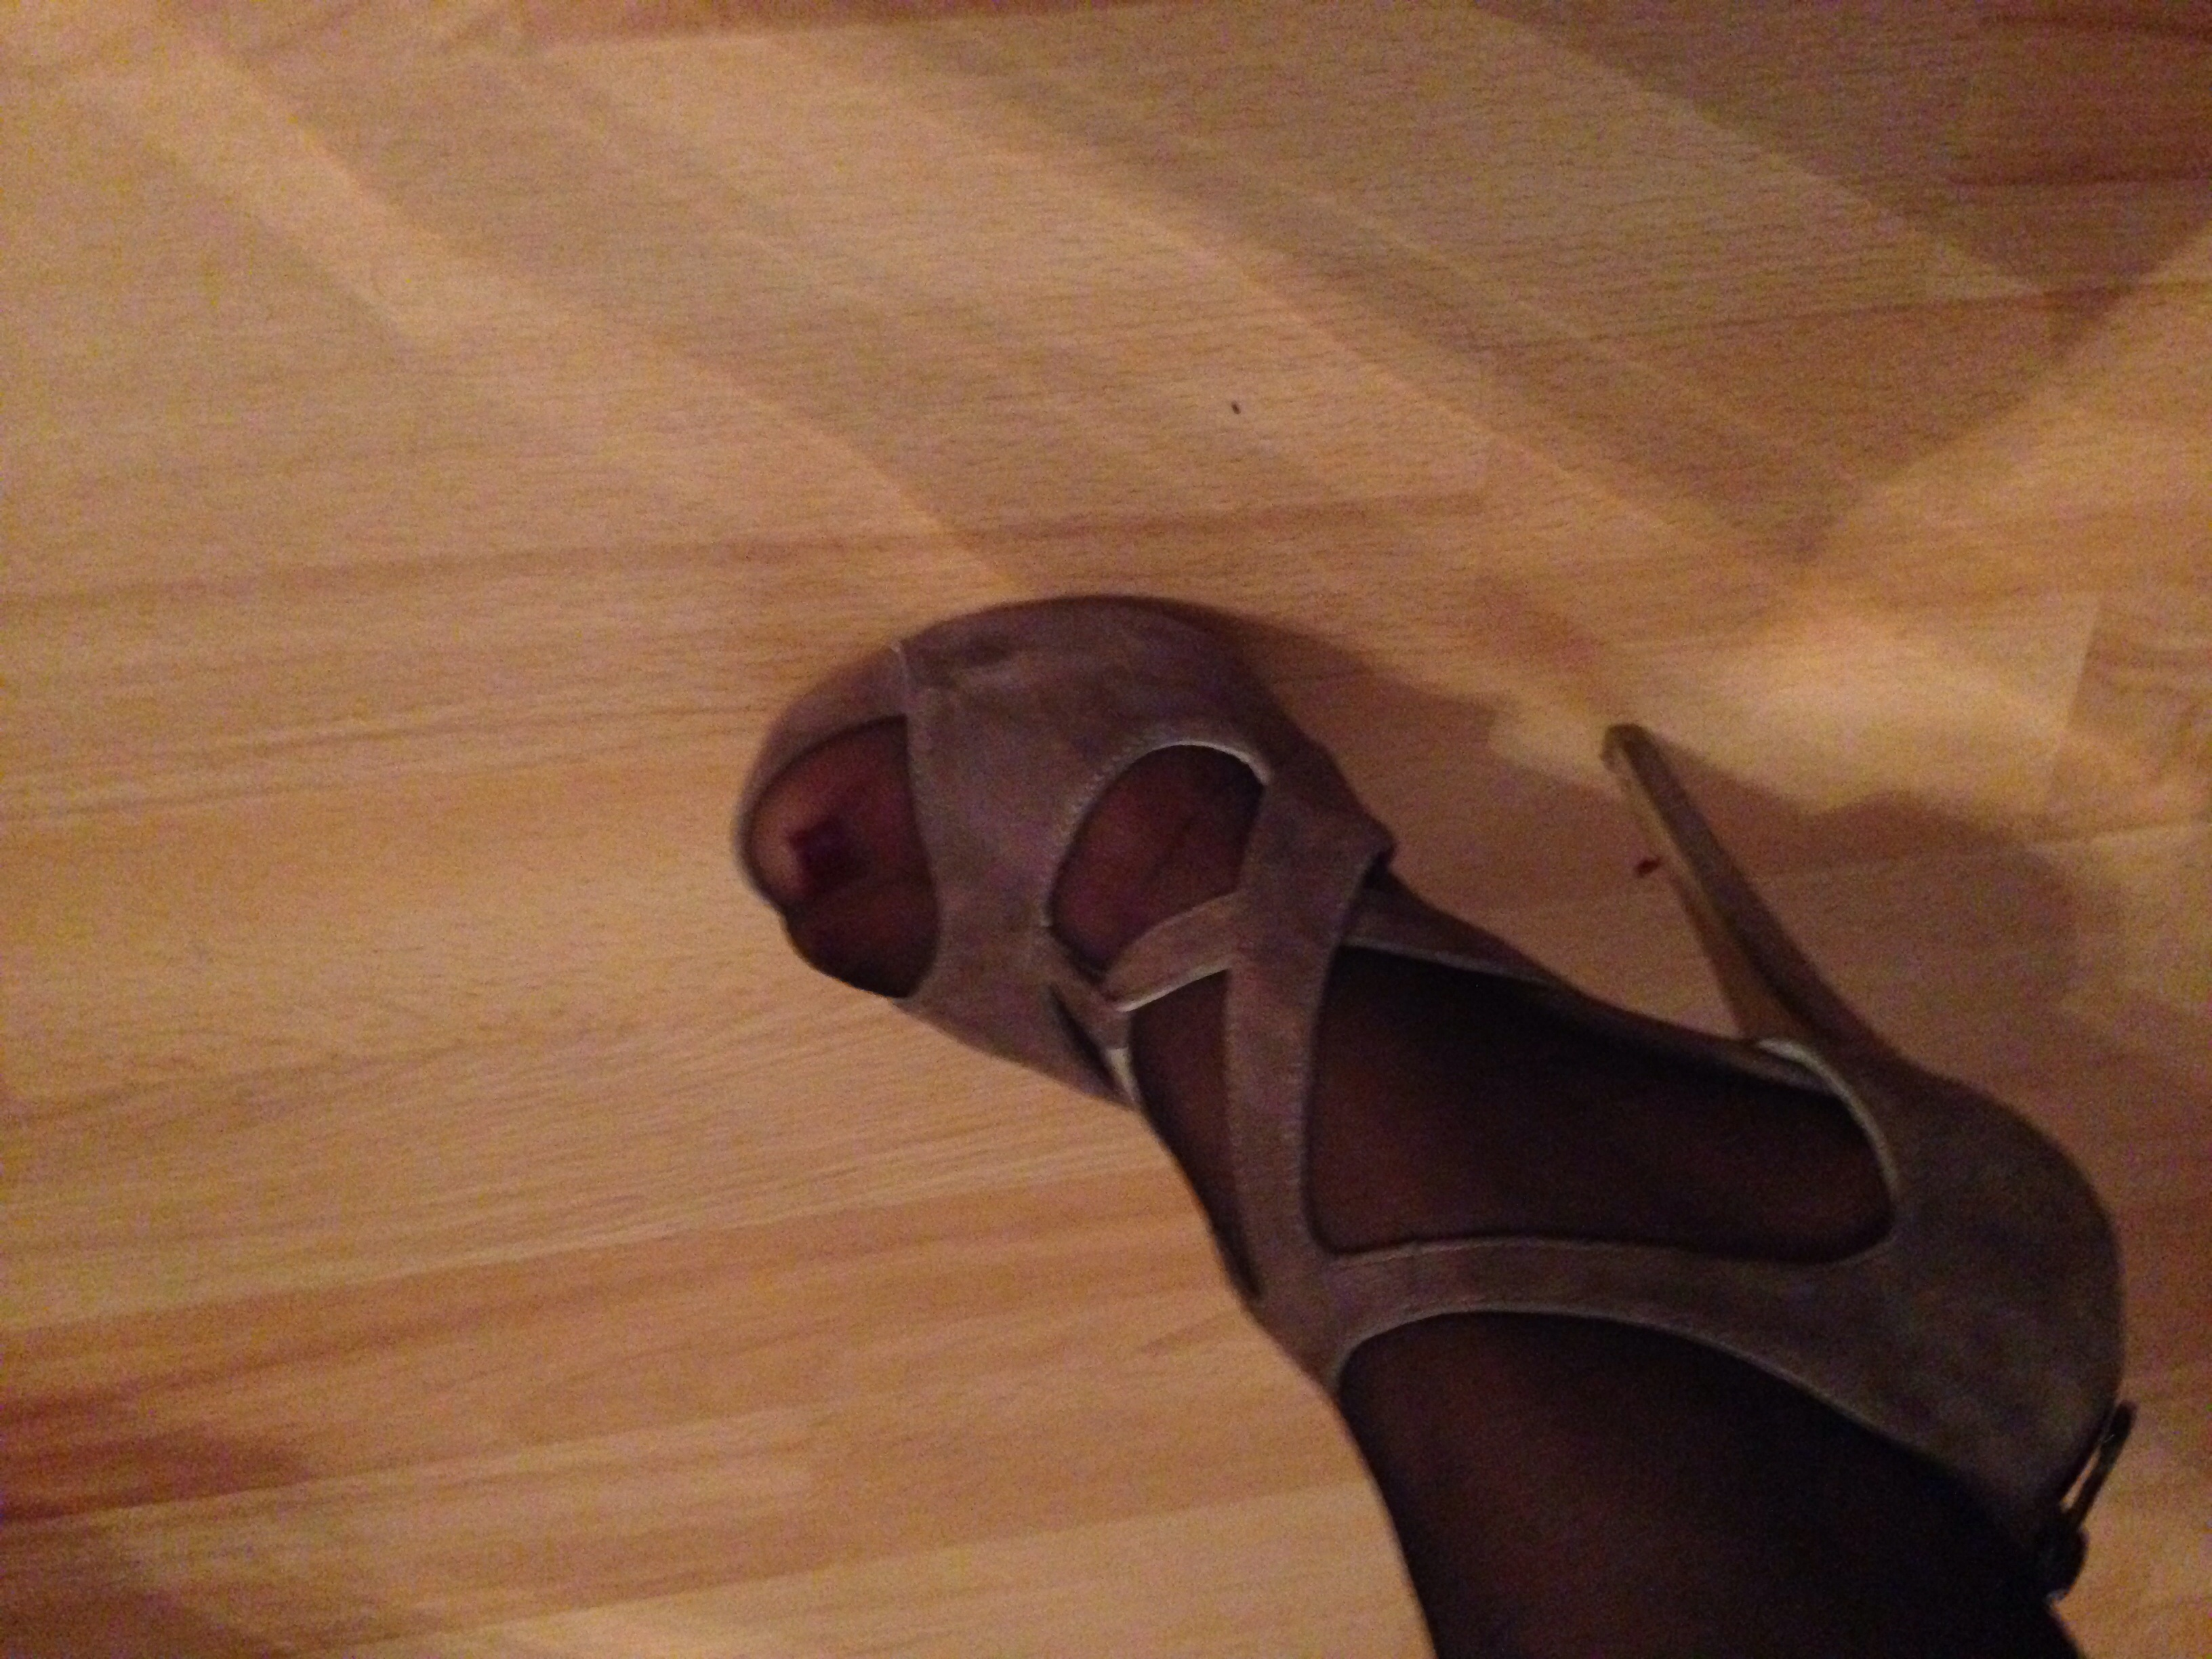 kann man diese high heels so tragen schuhe strumpfhose. Black Bedroom Furniture Sets. Home Design Ideas